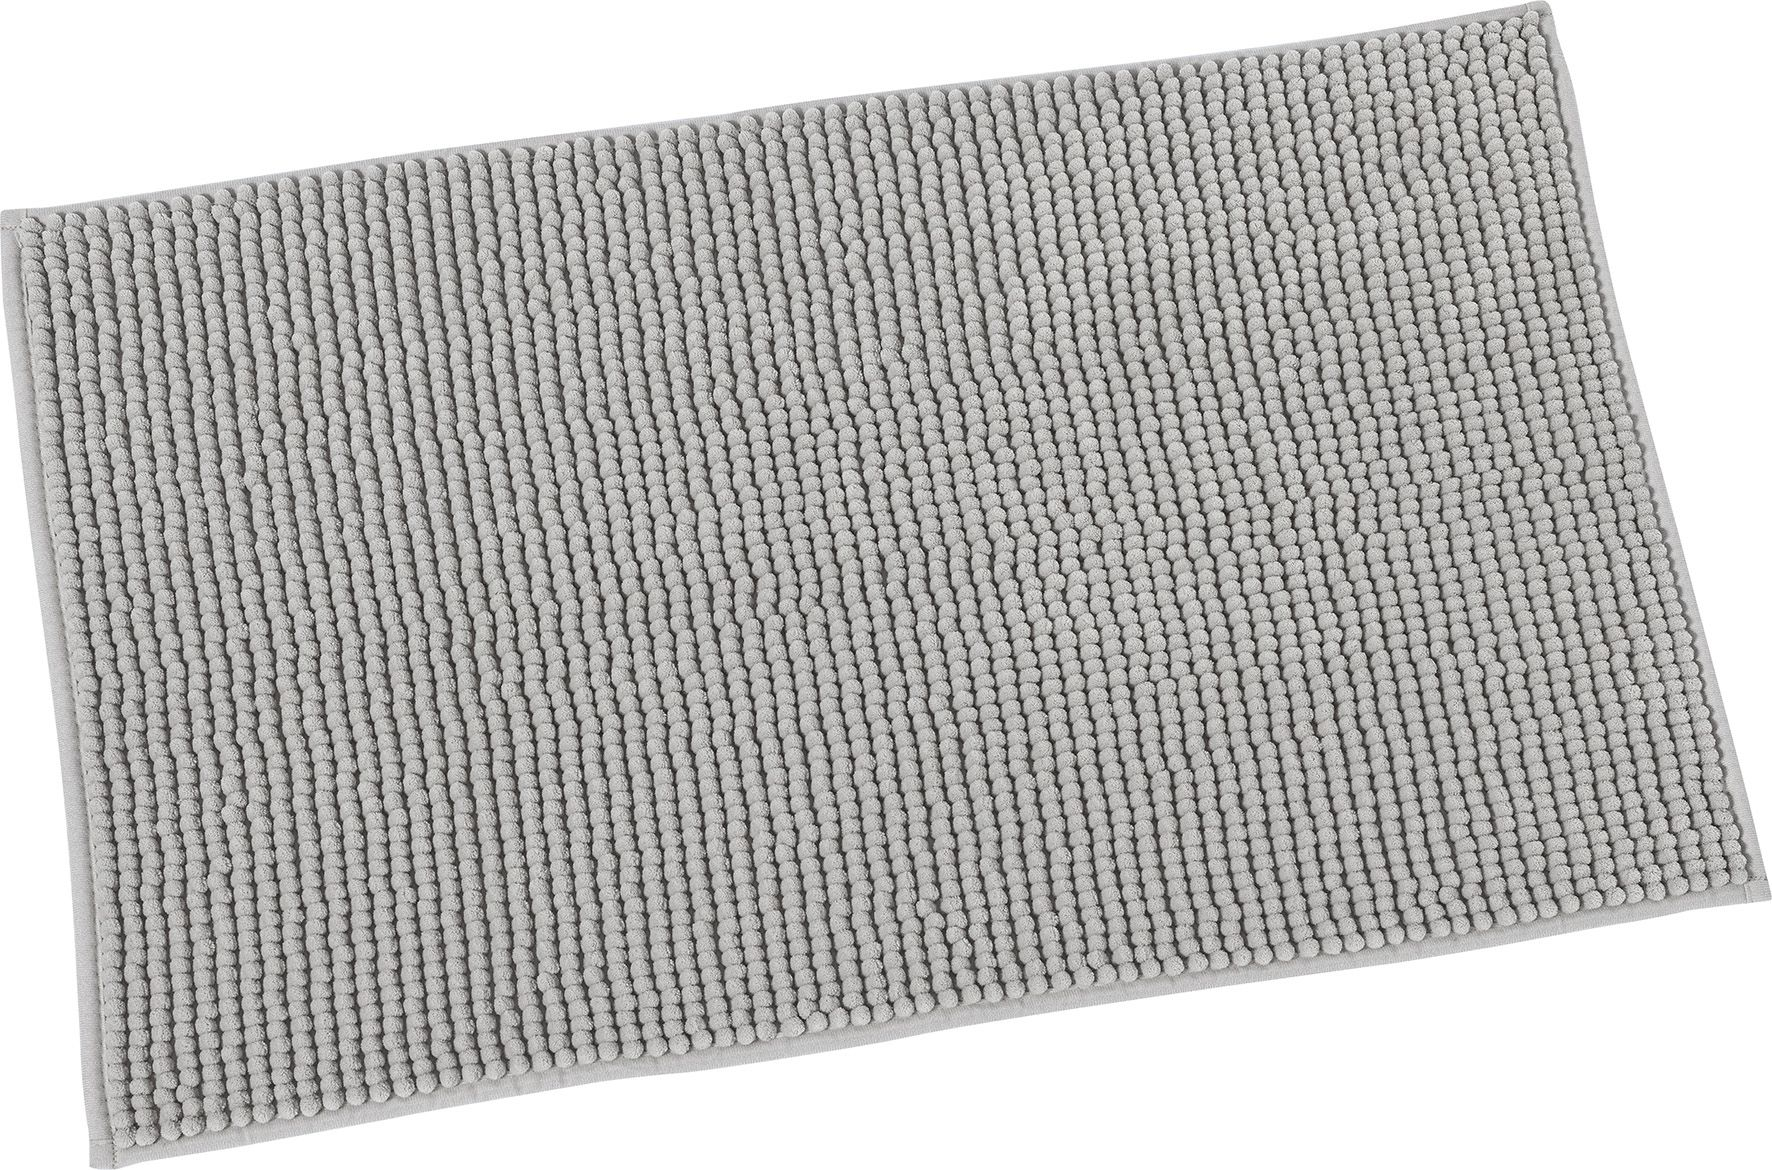 f6ee727fddd Vannitoamatt Zottel 50 x 80 cm Helehall